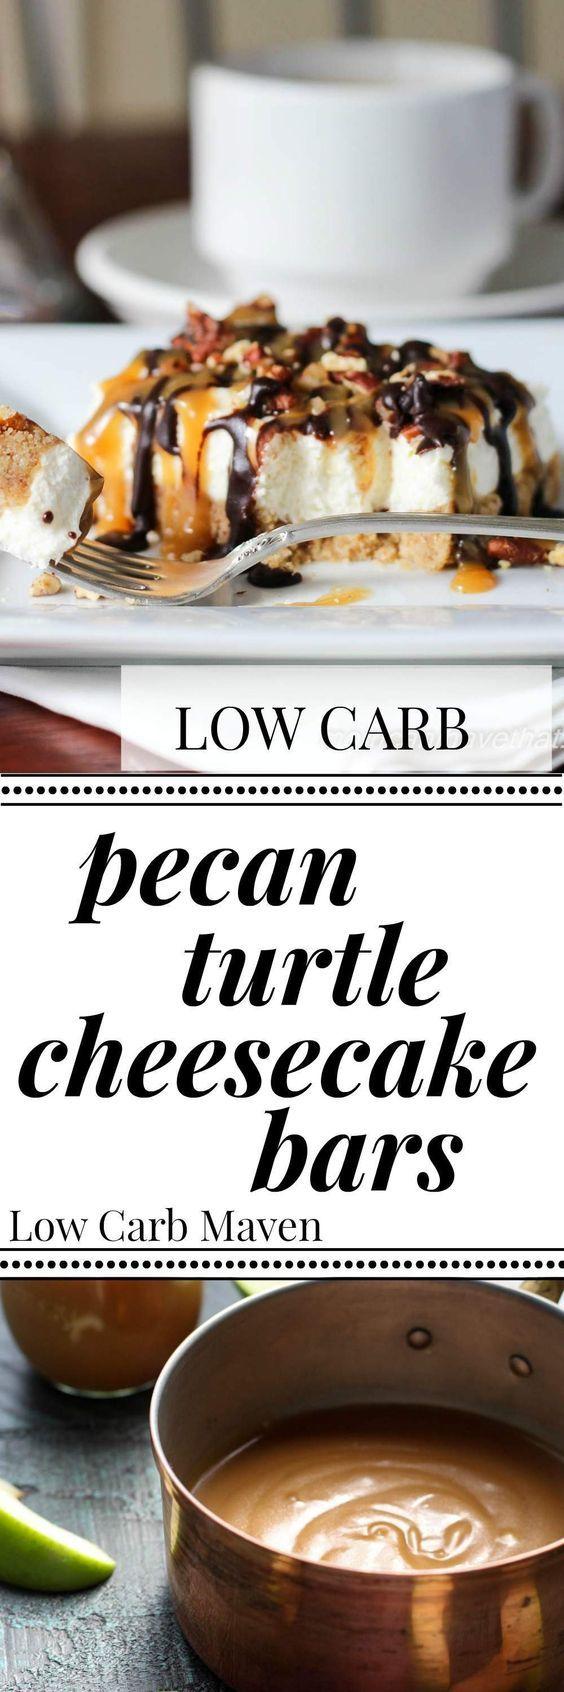 Pecan Turtle Cheesecake Bars are sugar free & keto